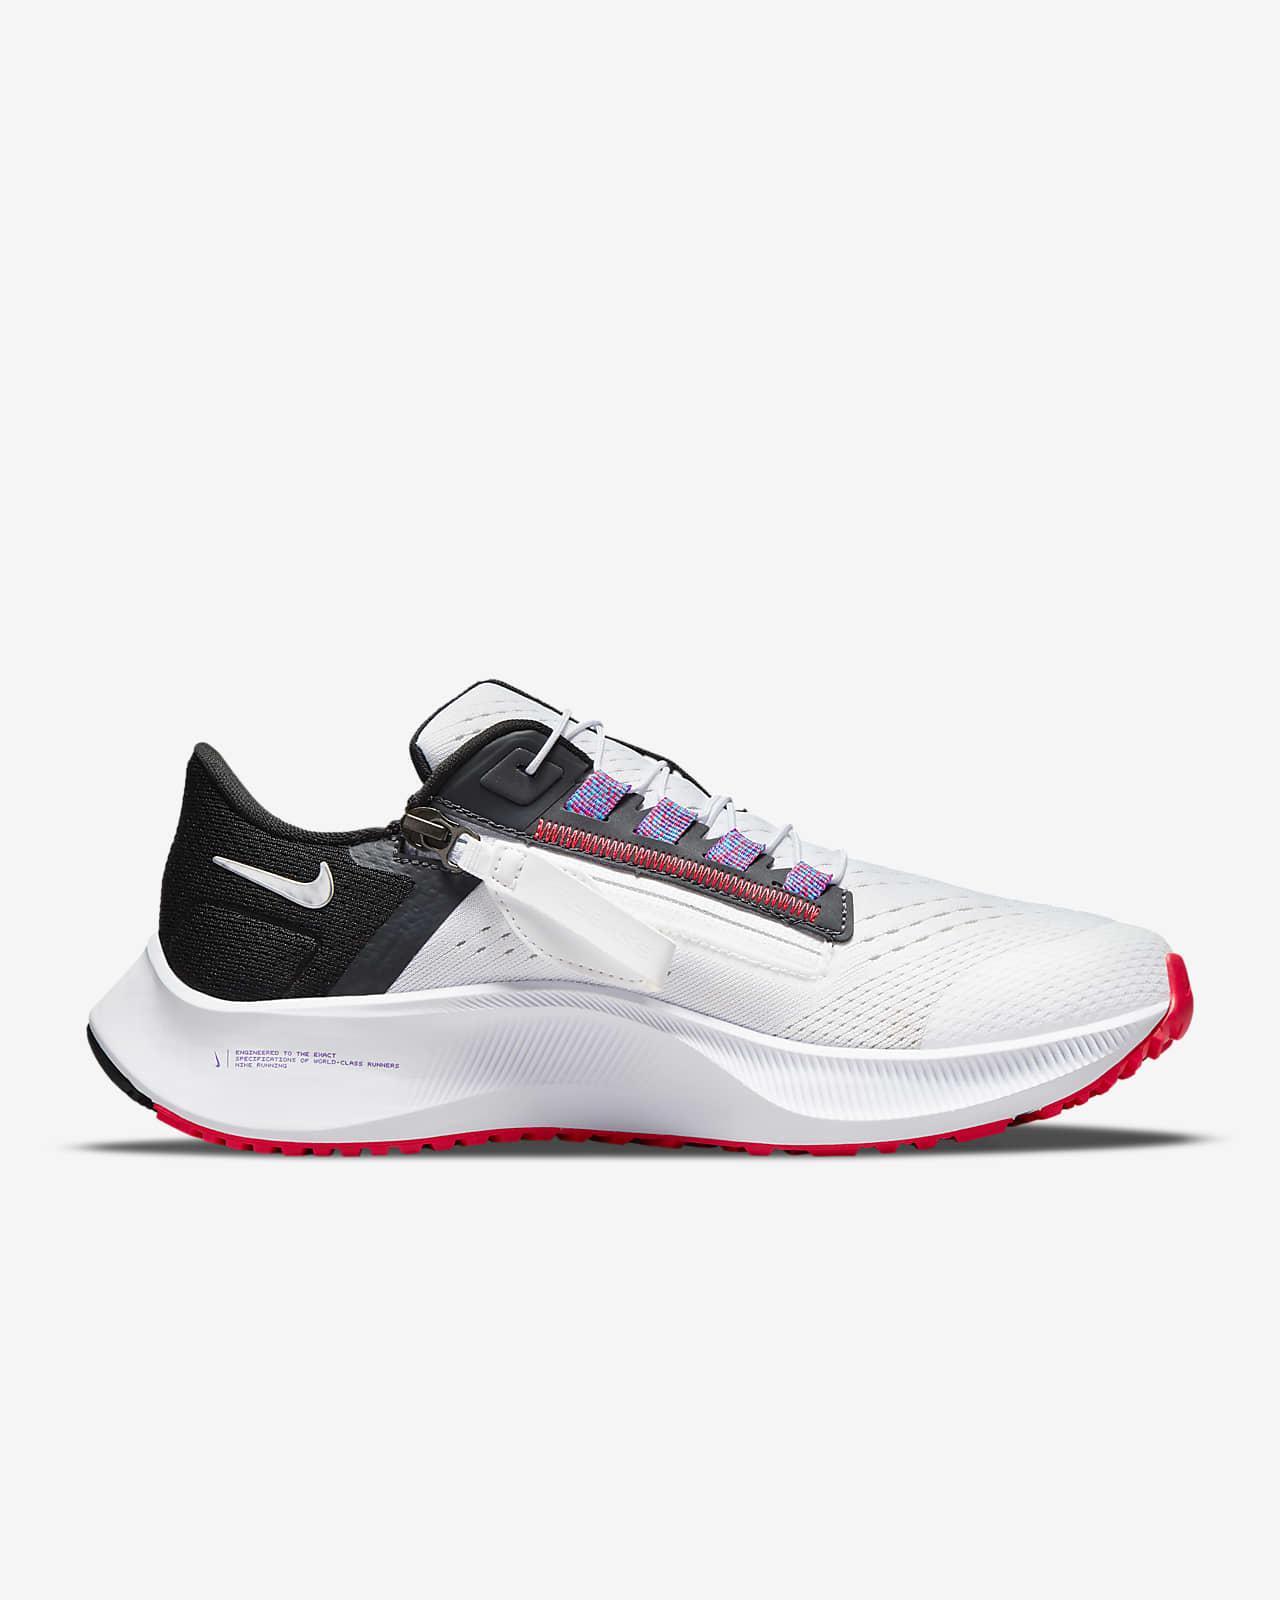 Chaussure de running Nike Air Zoom Pegasus 38 FlyEase pour Femme ...